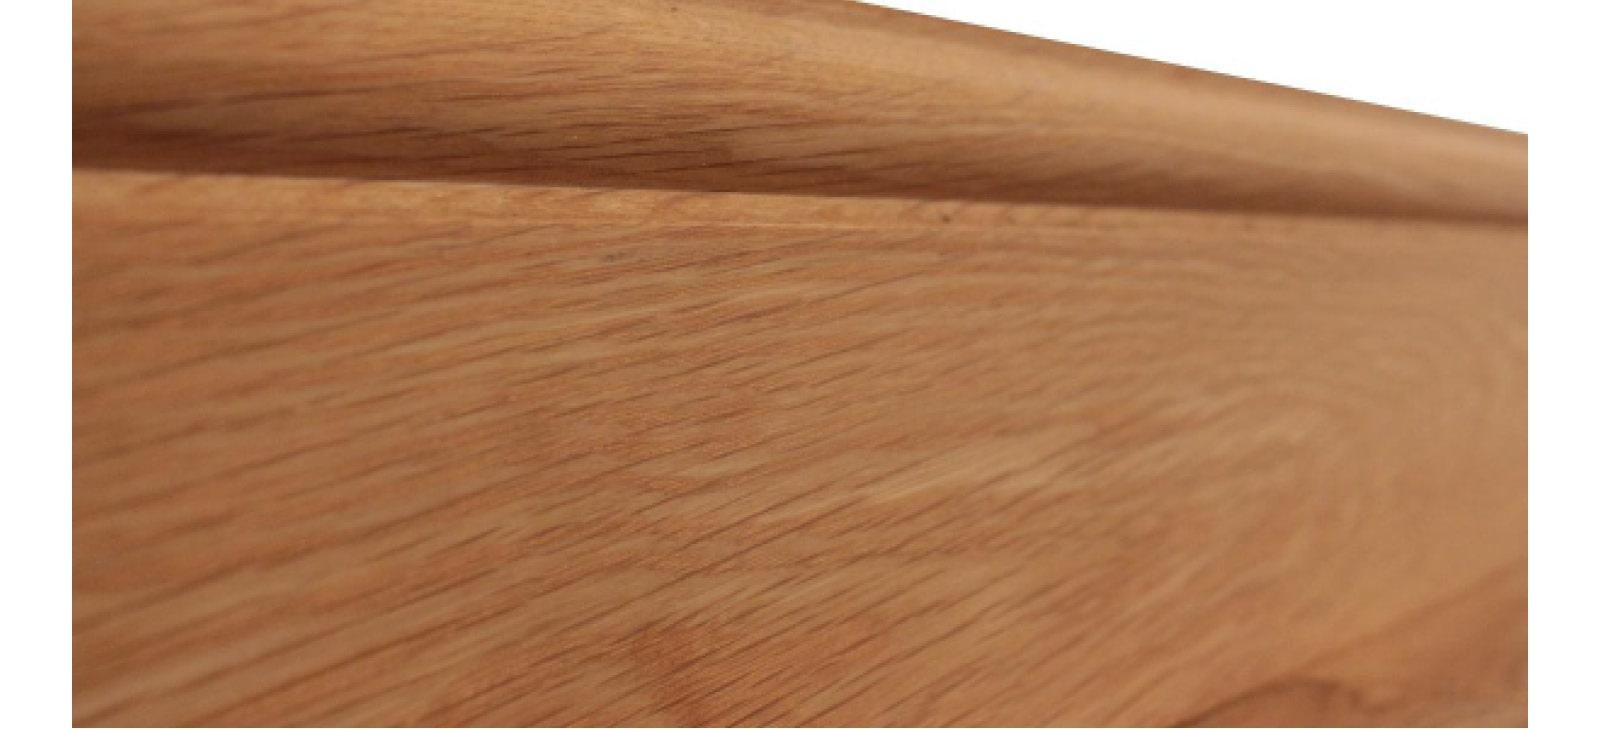 Unpainted wooden skirting